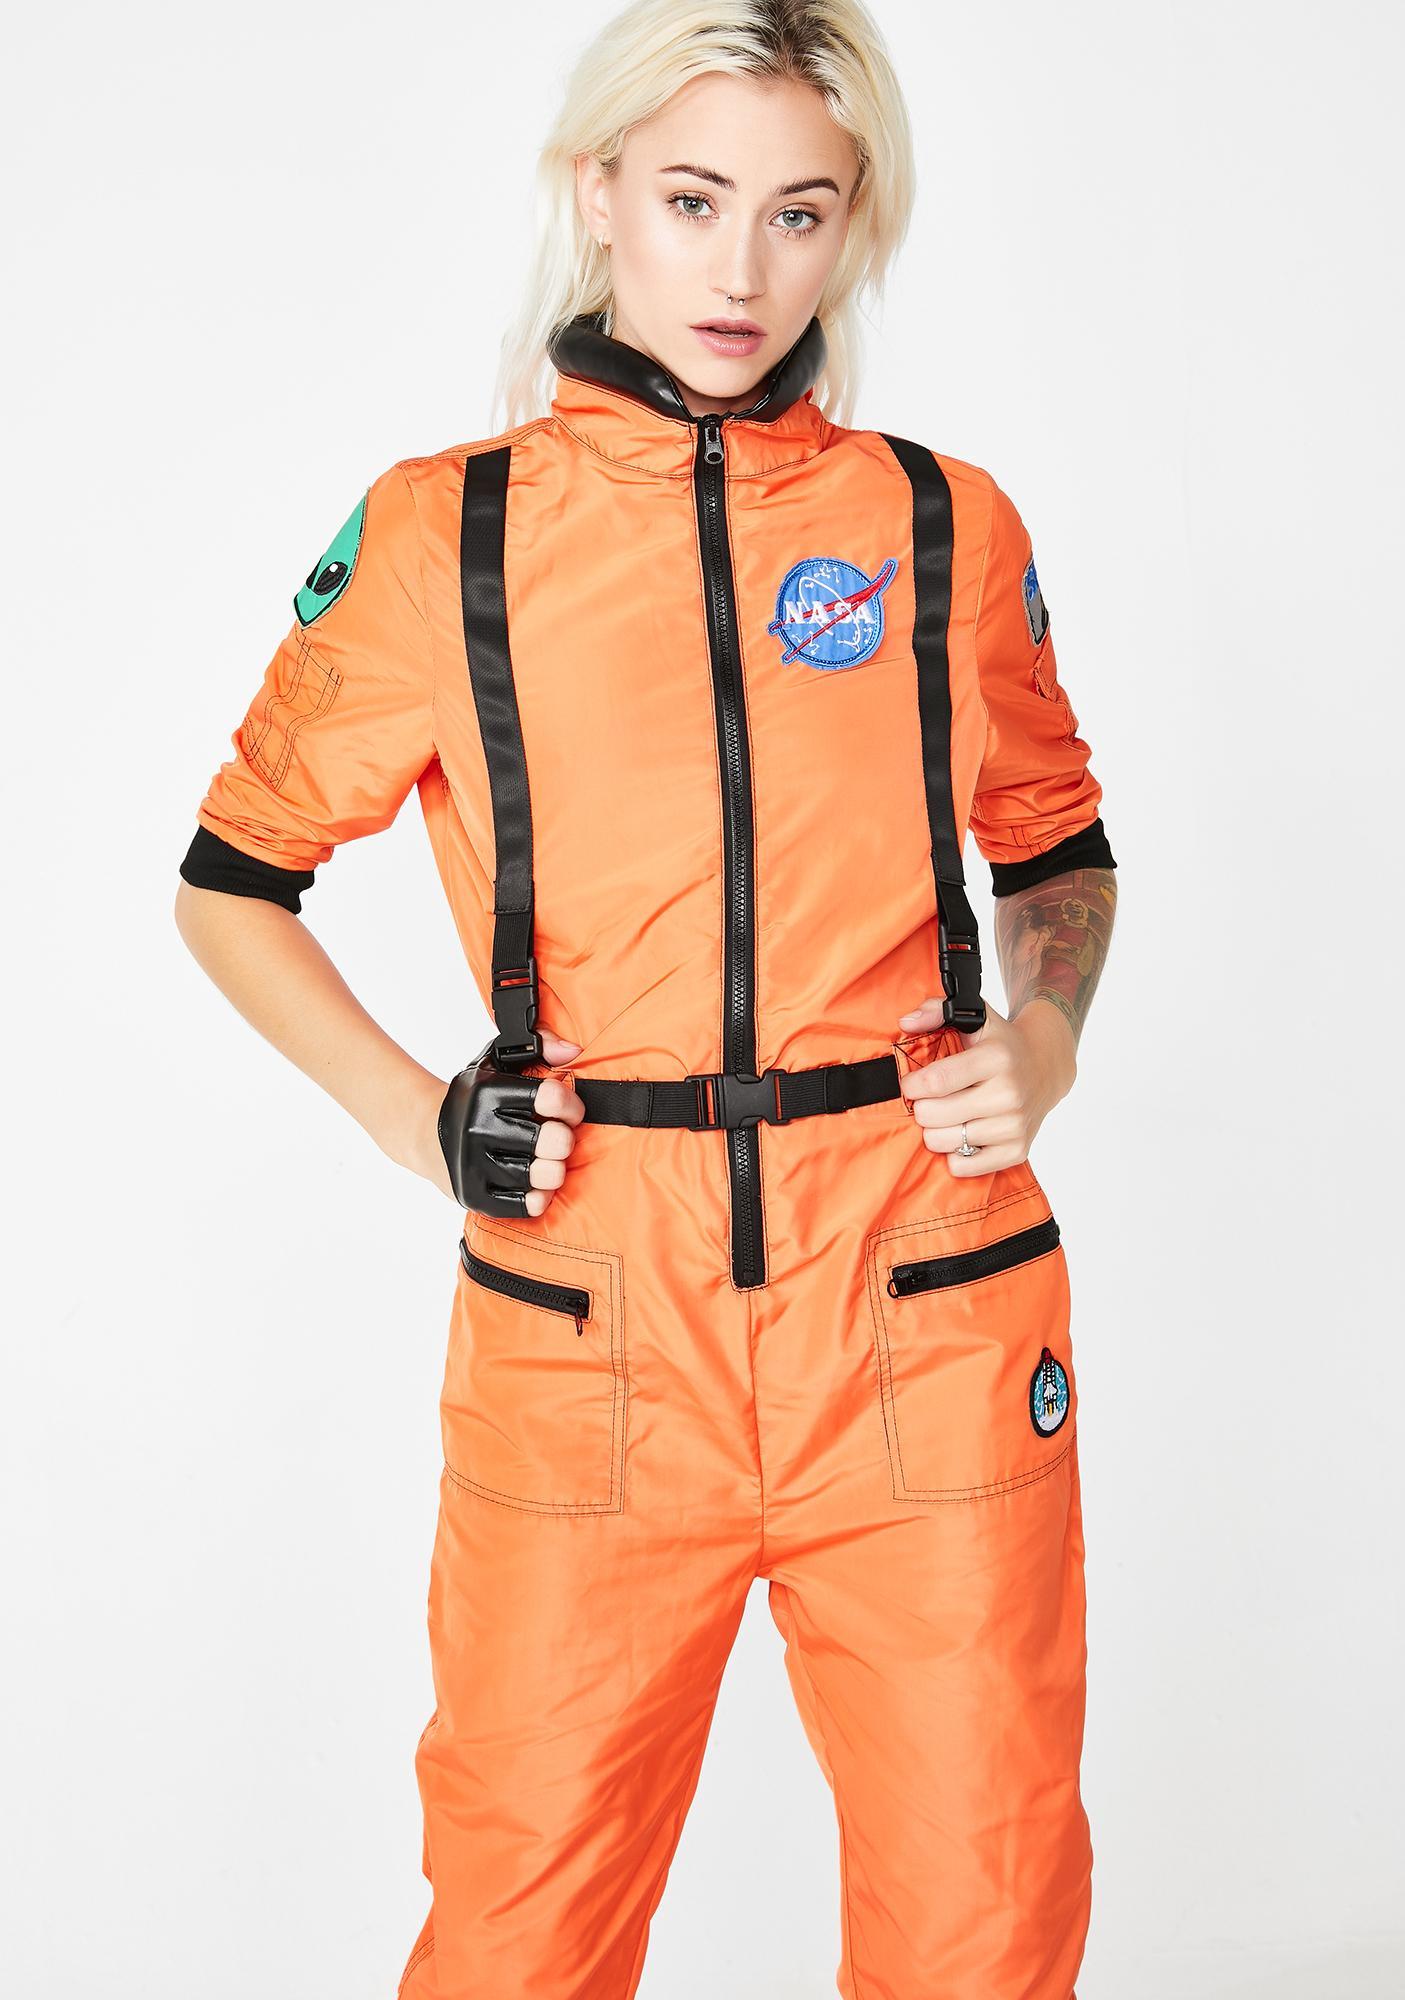 c2a5db4fc90 Orange NASA Spacesuit Jumpsuit Costume